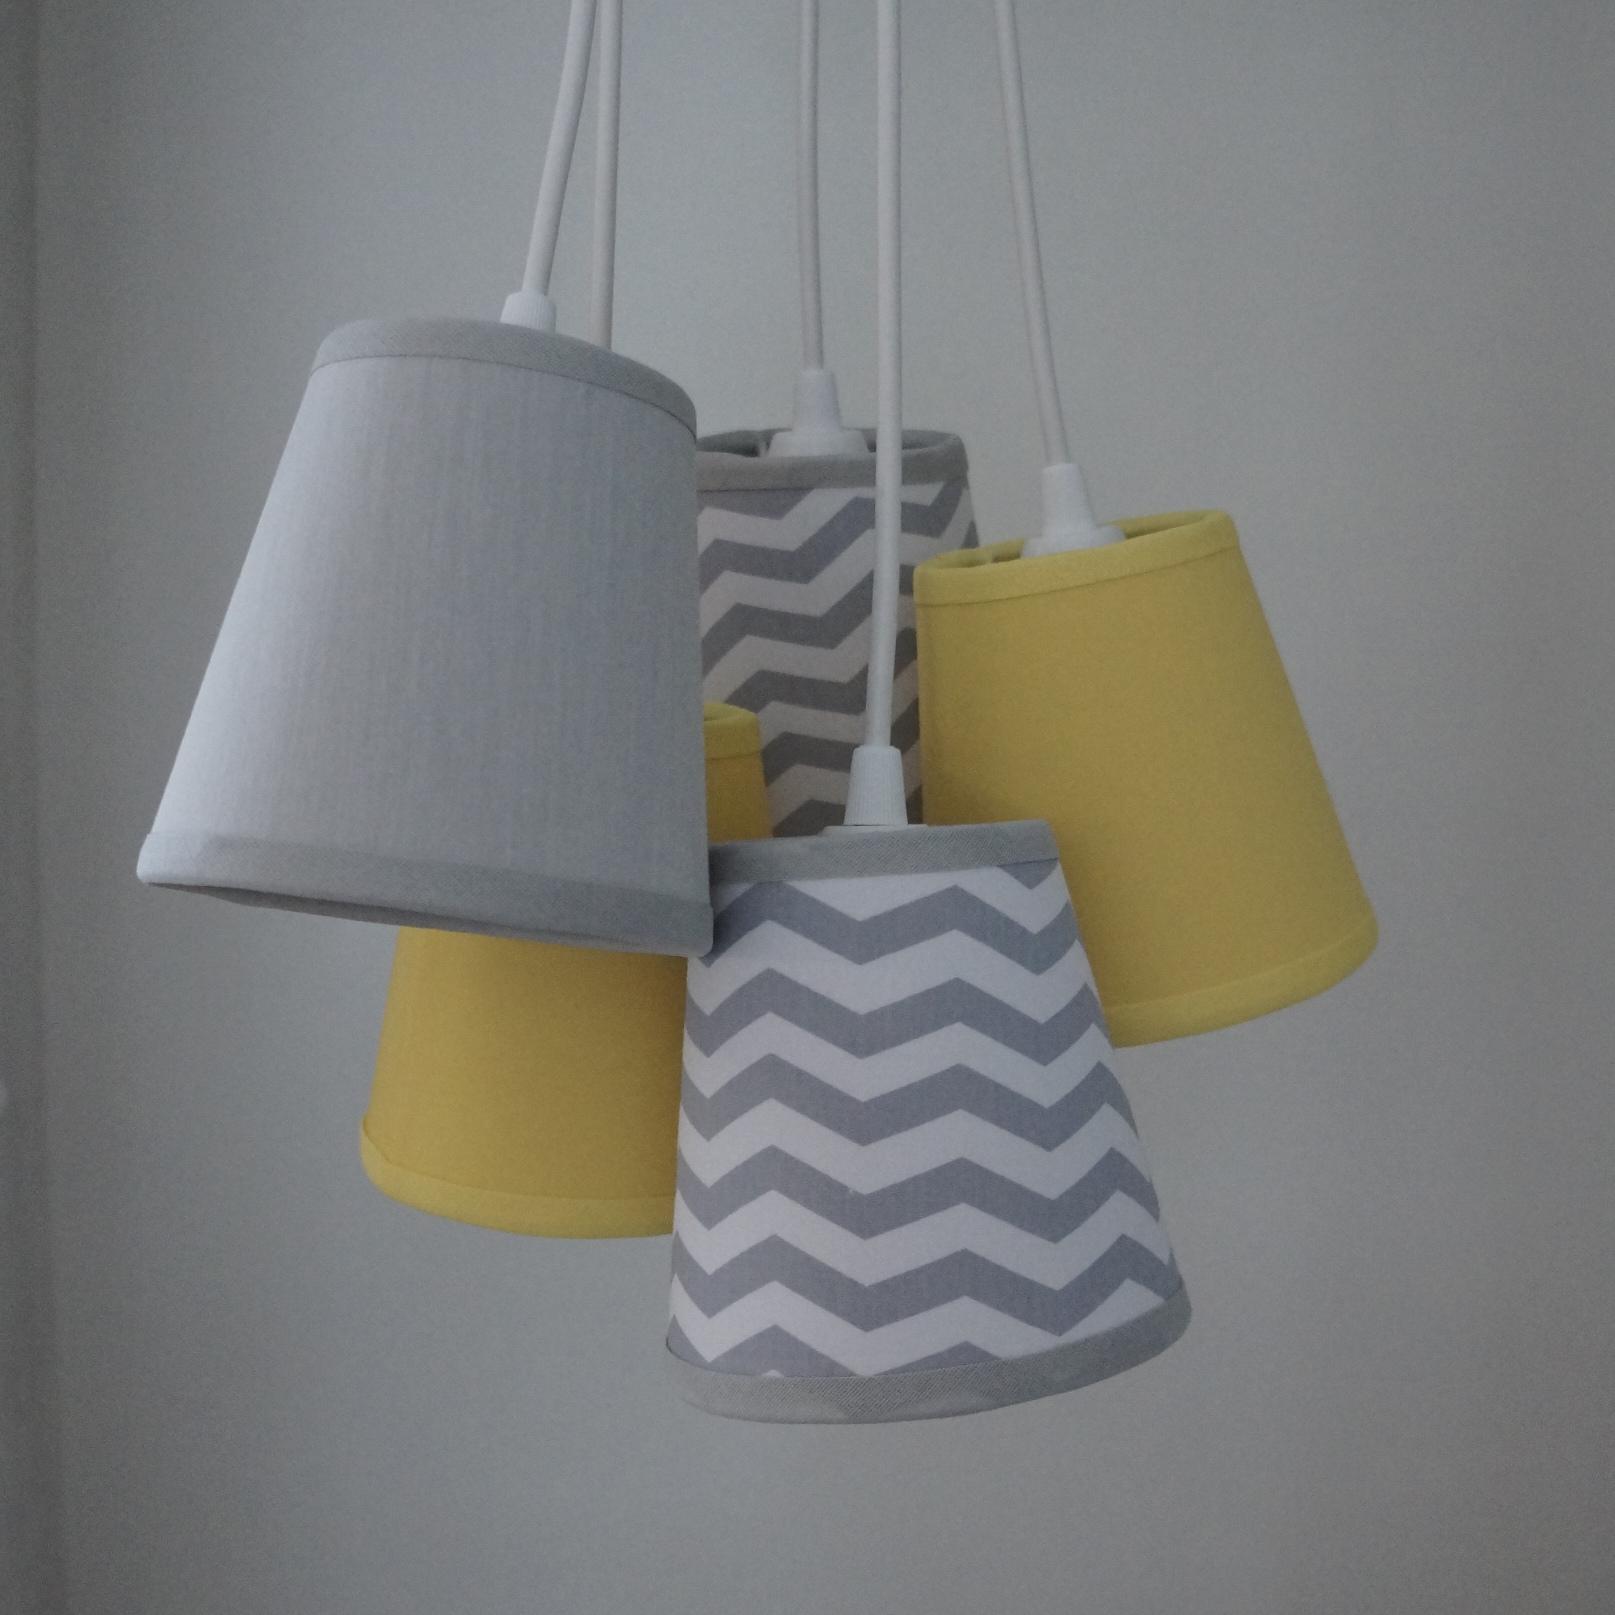 lustre pendente beb chevron crie casa decoracao elo7. Black Bedroom Furniture Sets. Home Design Ideas